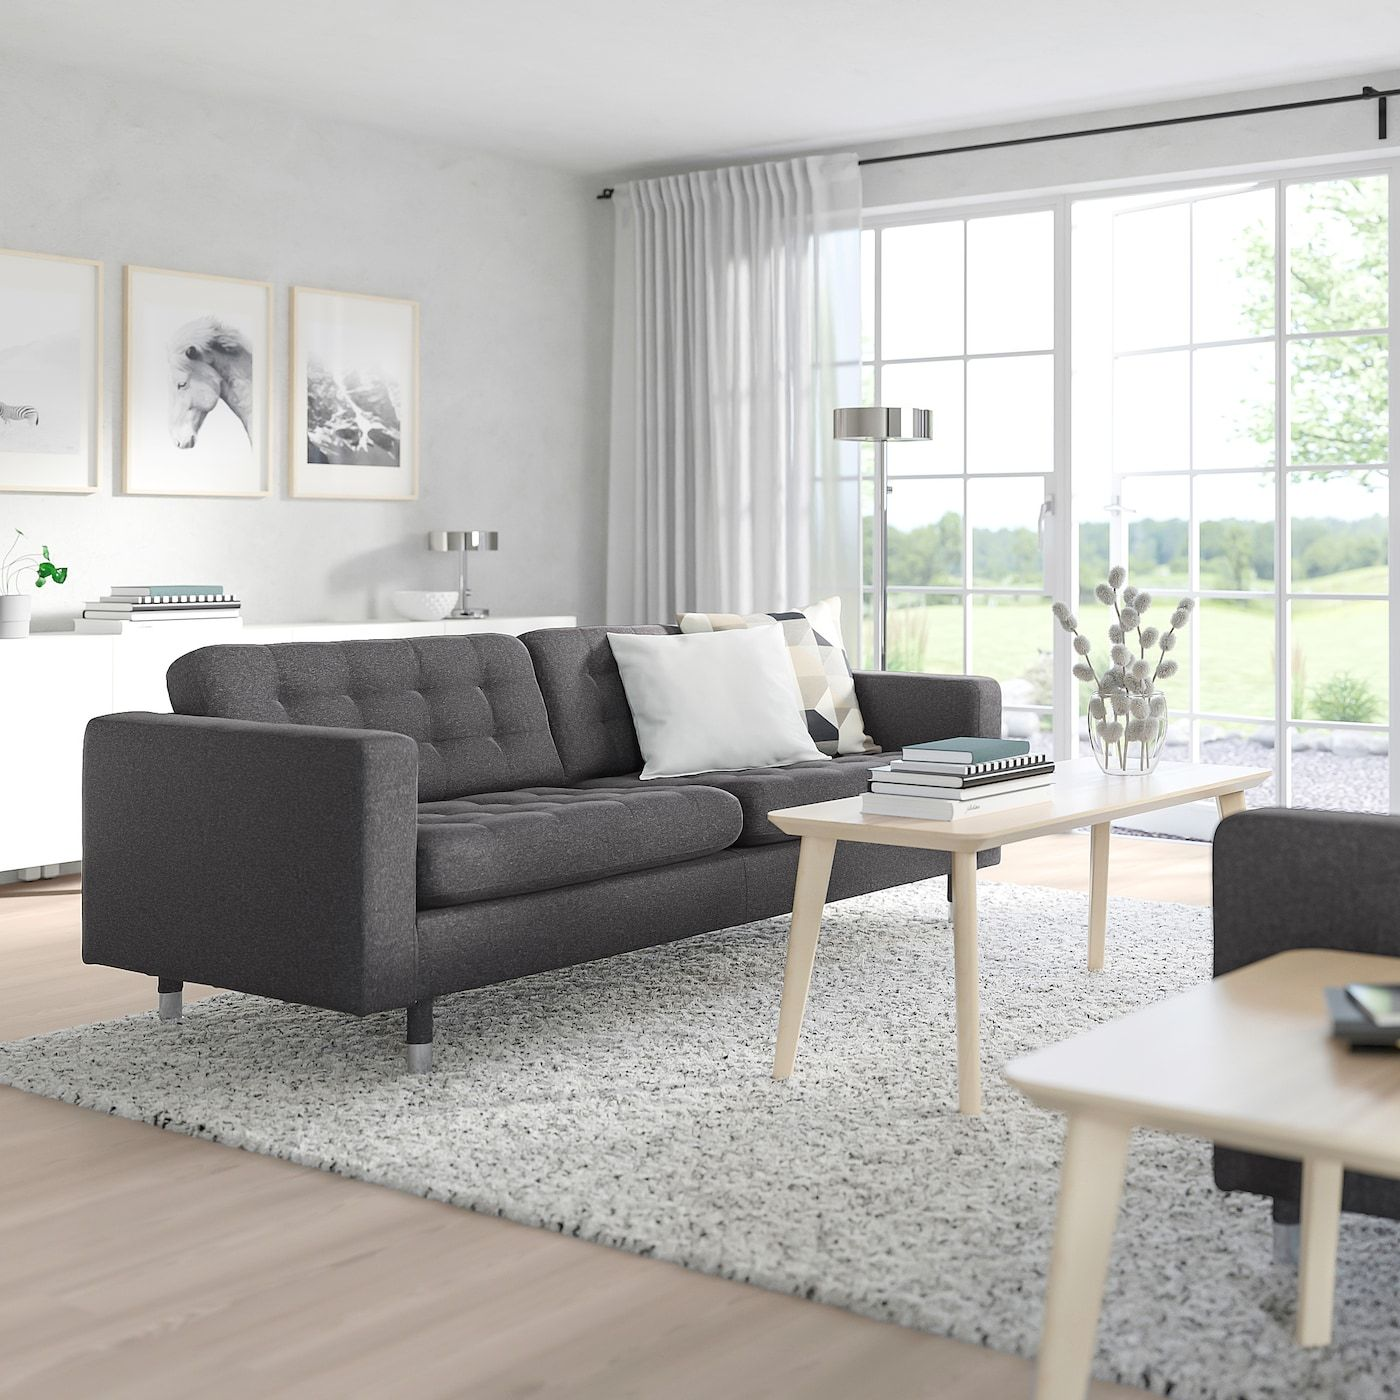 Morabo Sofa Gunnared Dark Gray Width 81 1 8 Height 31 7 8 Get It Today Ikea Grey Couch Living Room Grey Sofa Living Room Dark Grey Couch Living Room